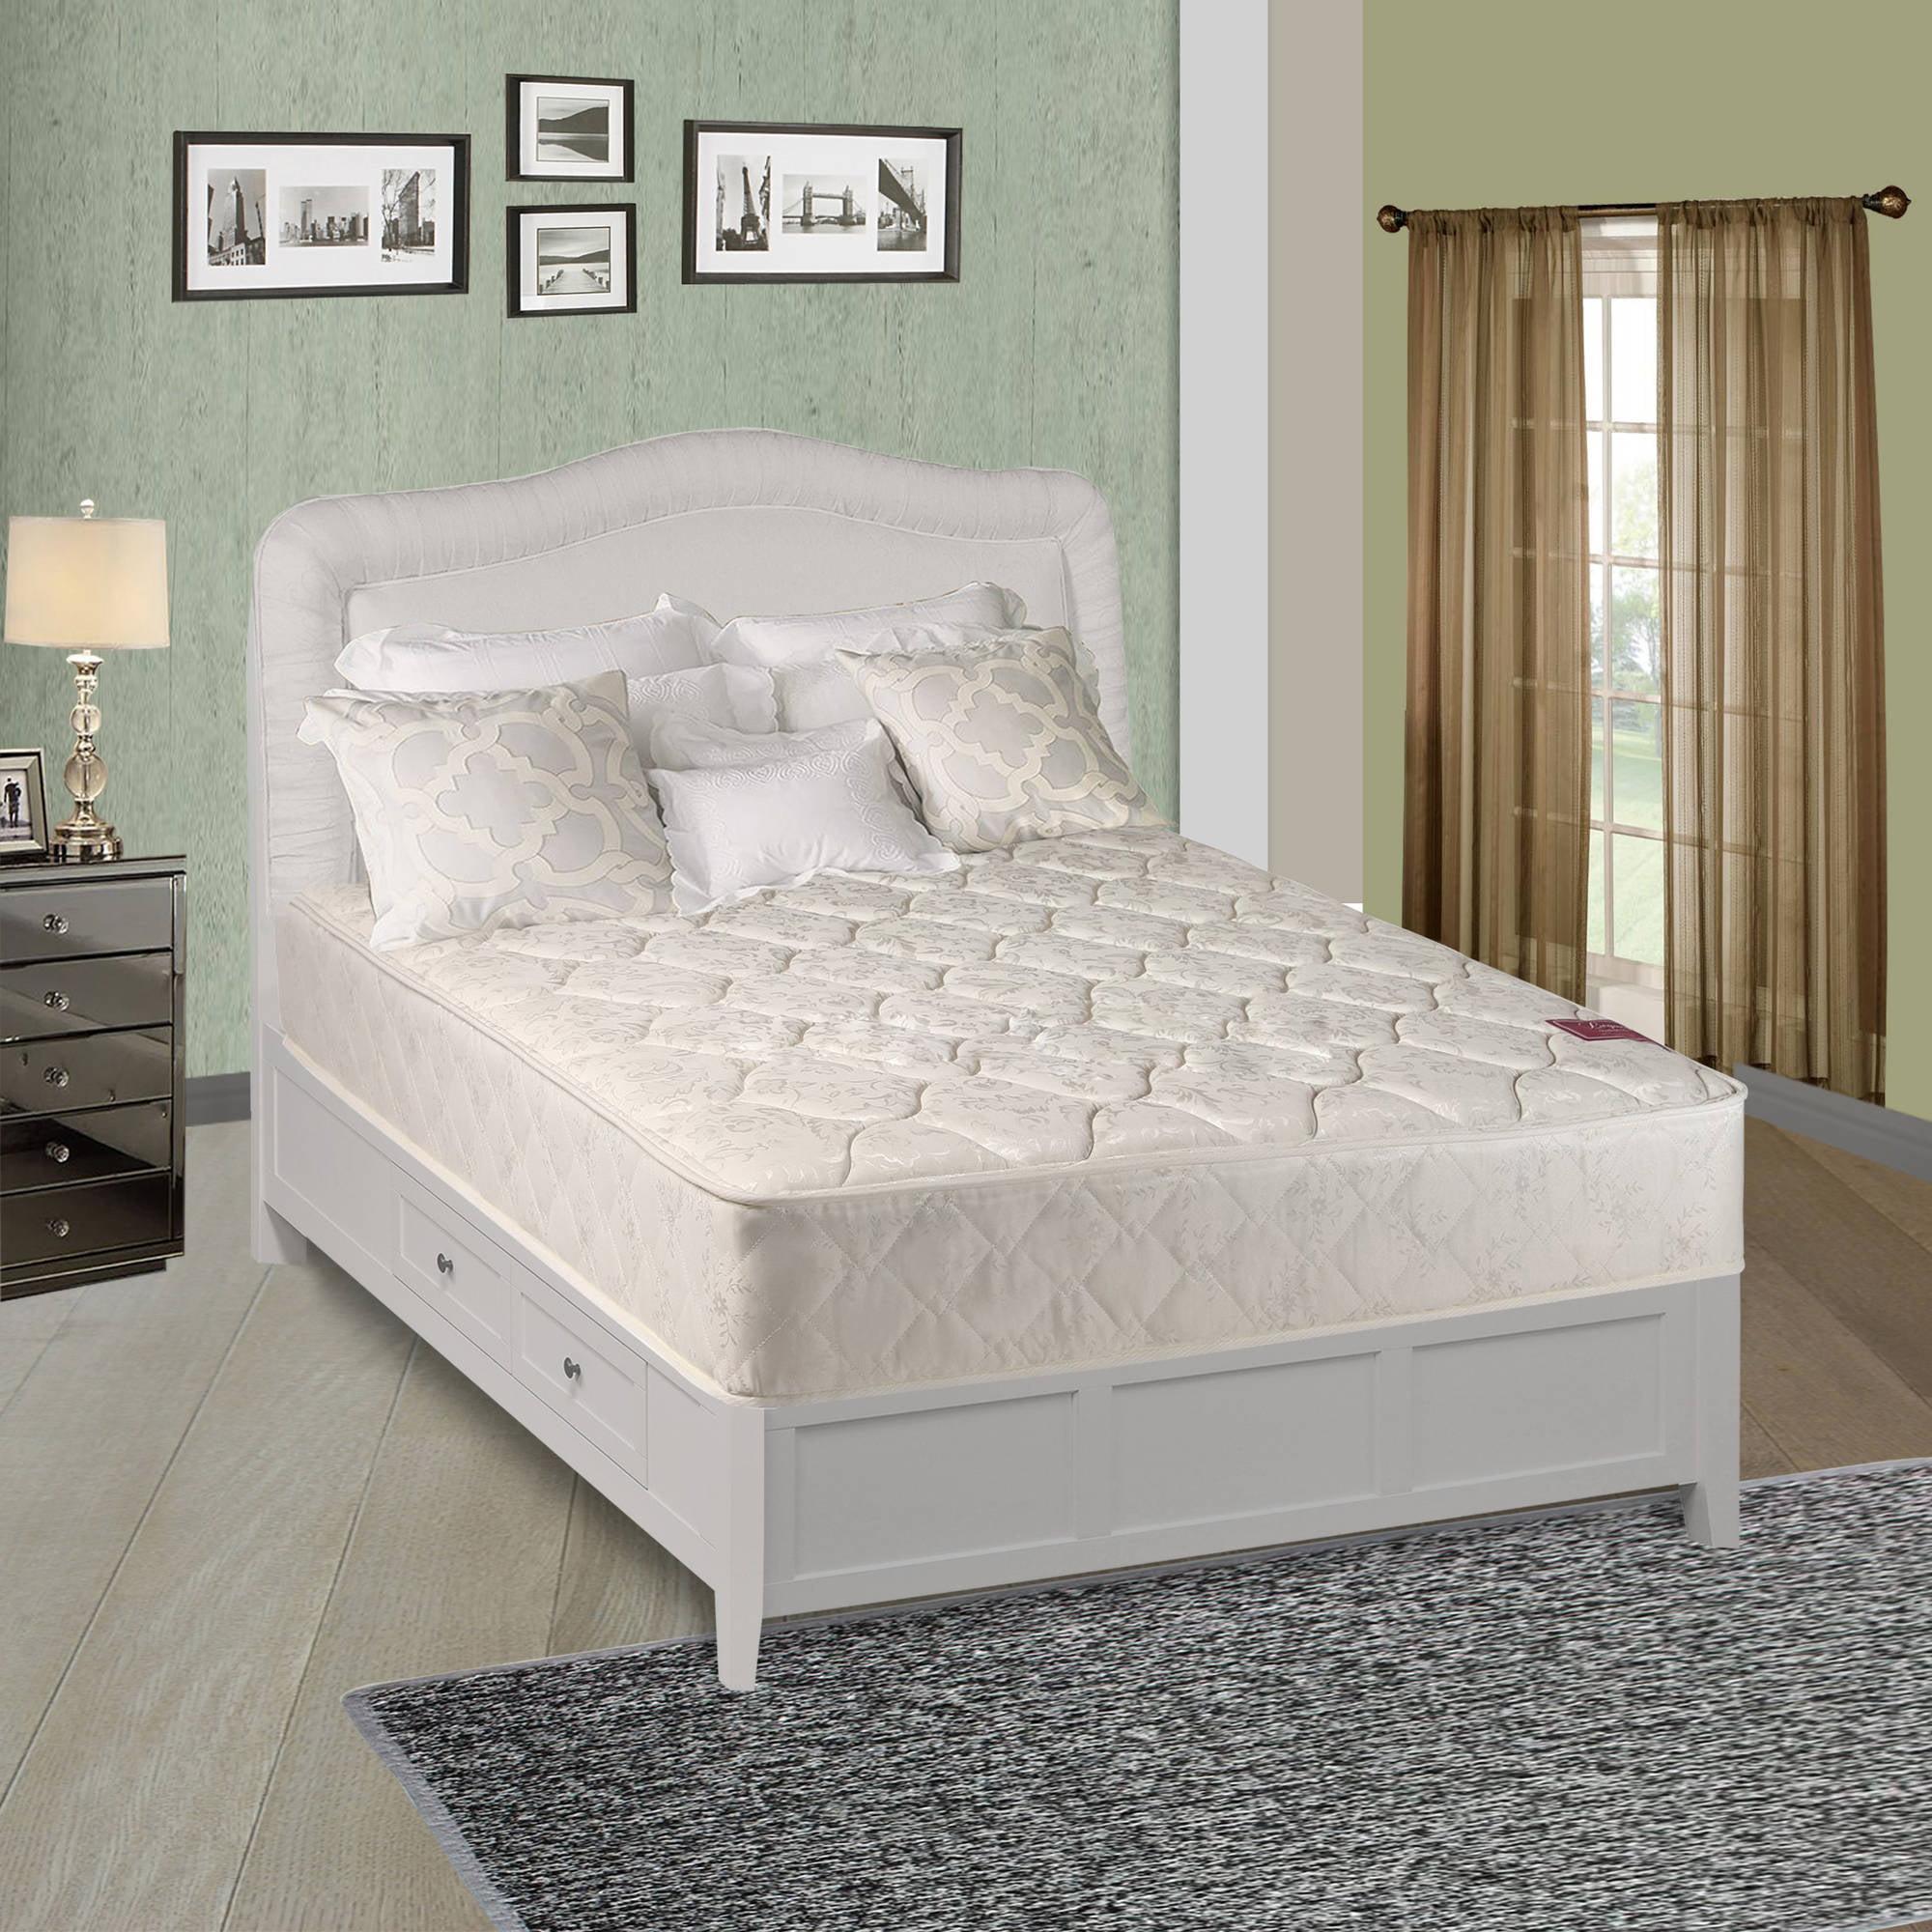 "Continental Sleep Elegant Collection Firm Orthopedic 5"" Twin"